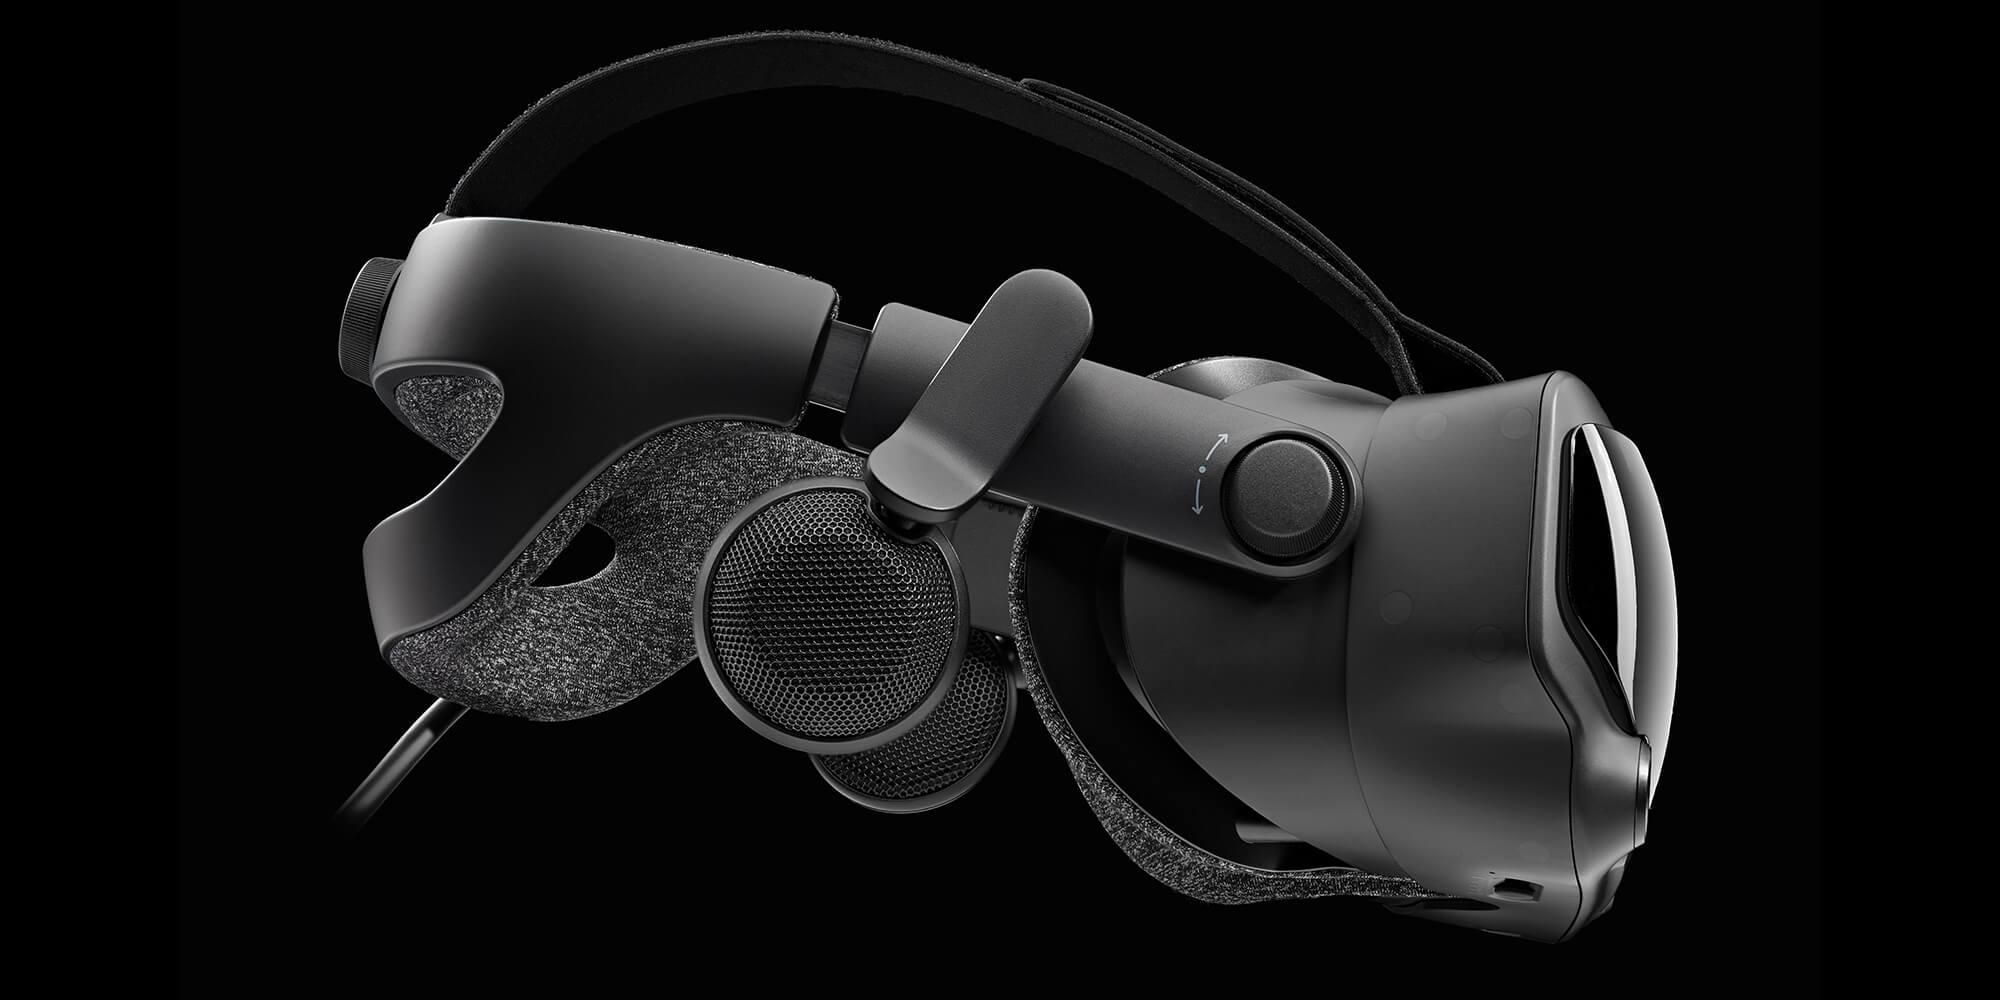 Headset - Valve Index® - Upgrade your experience - Valve Corporation